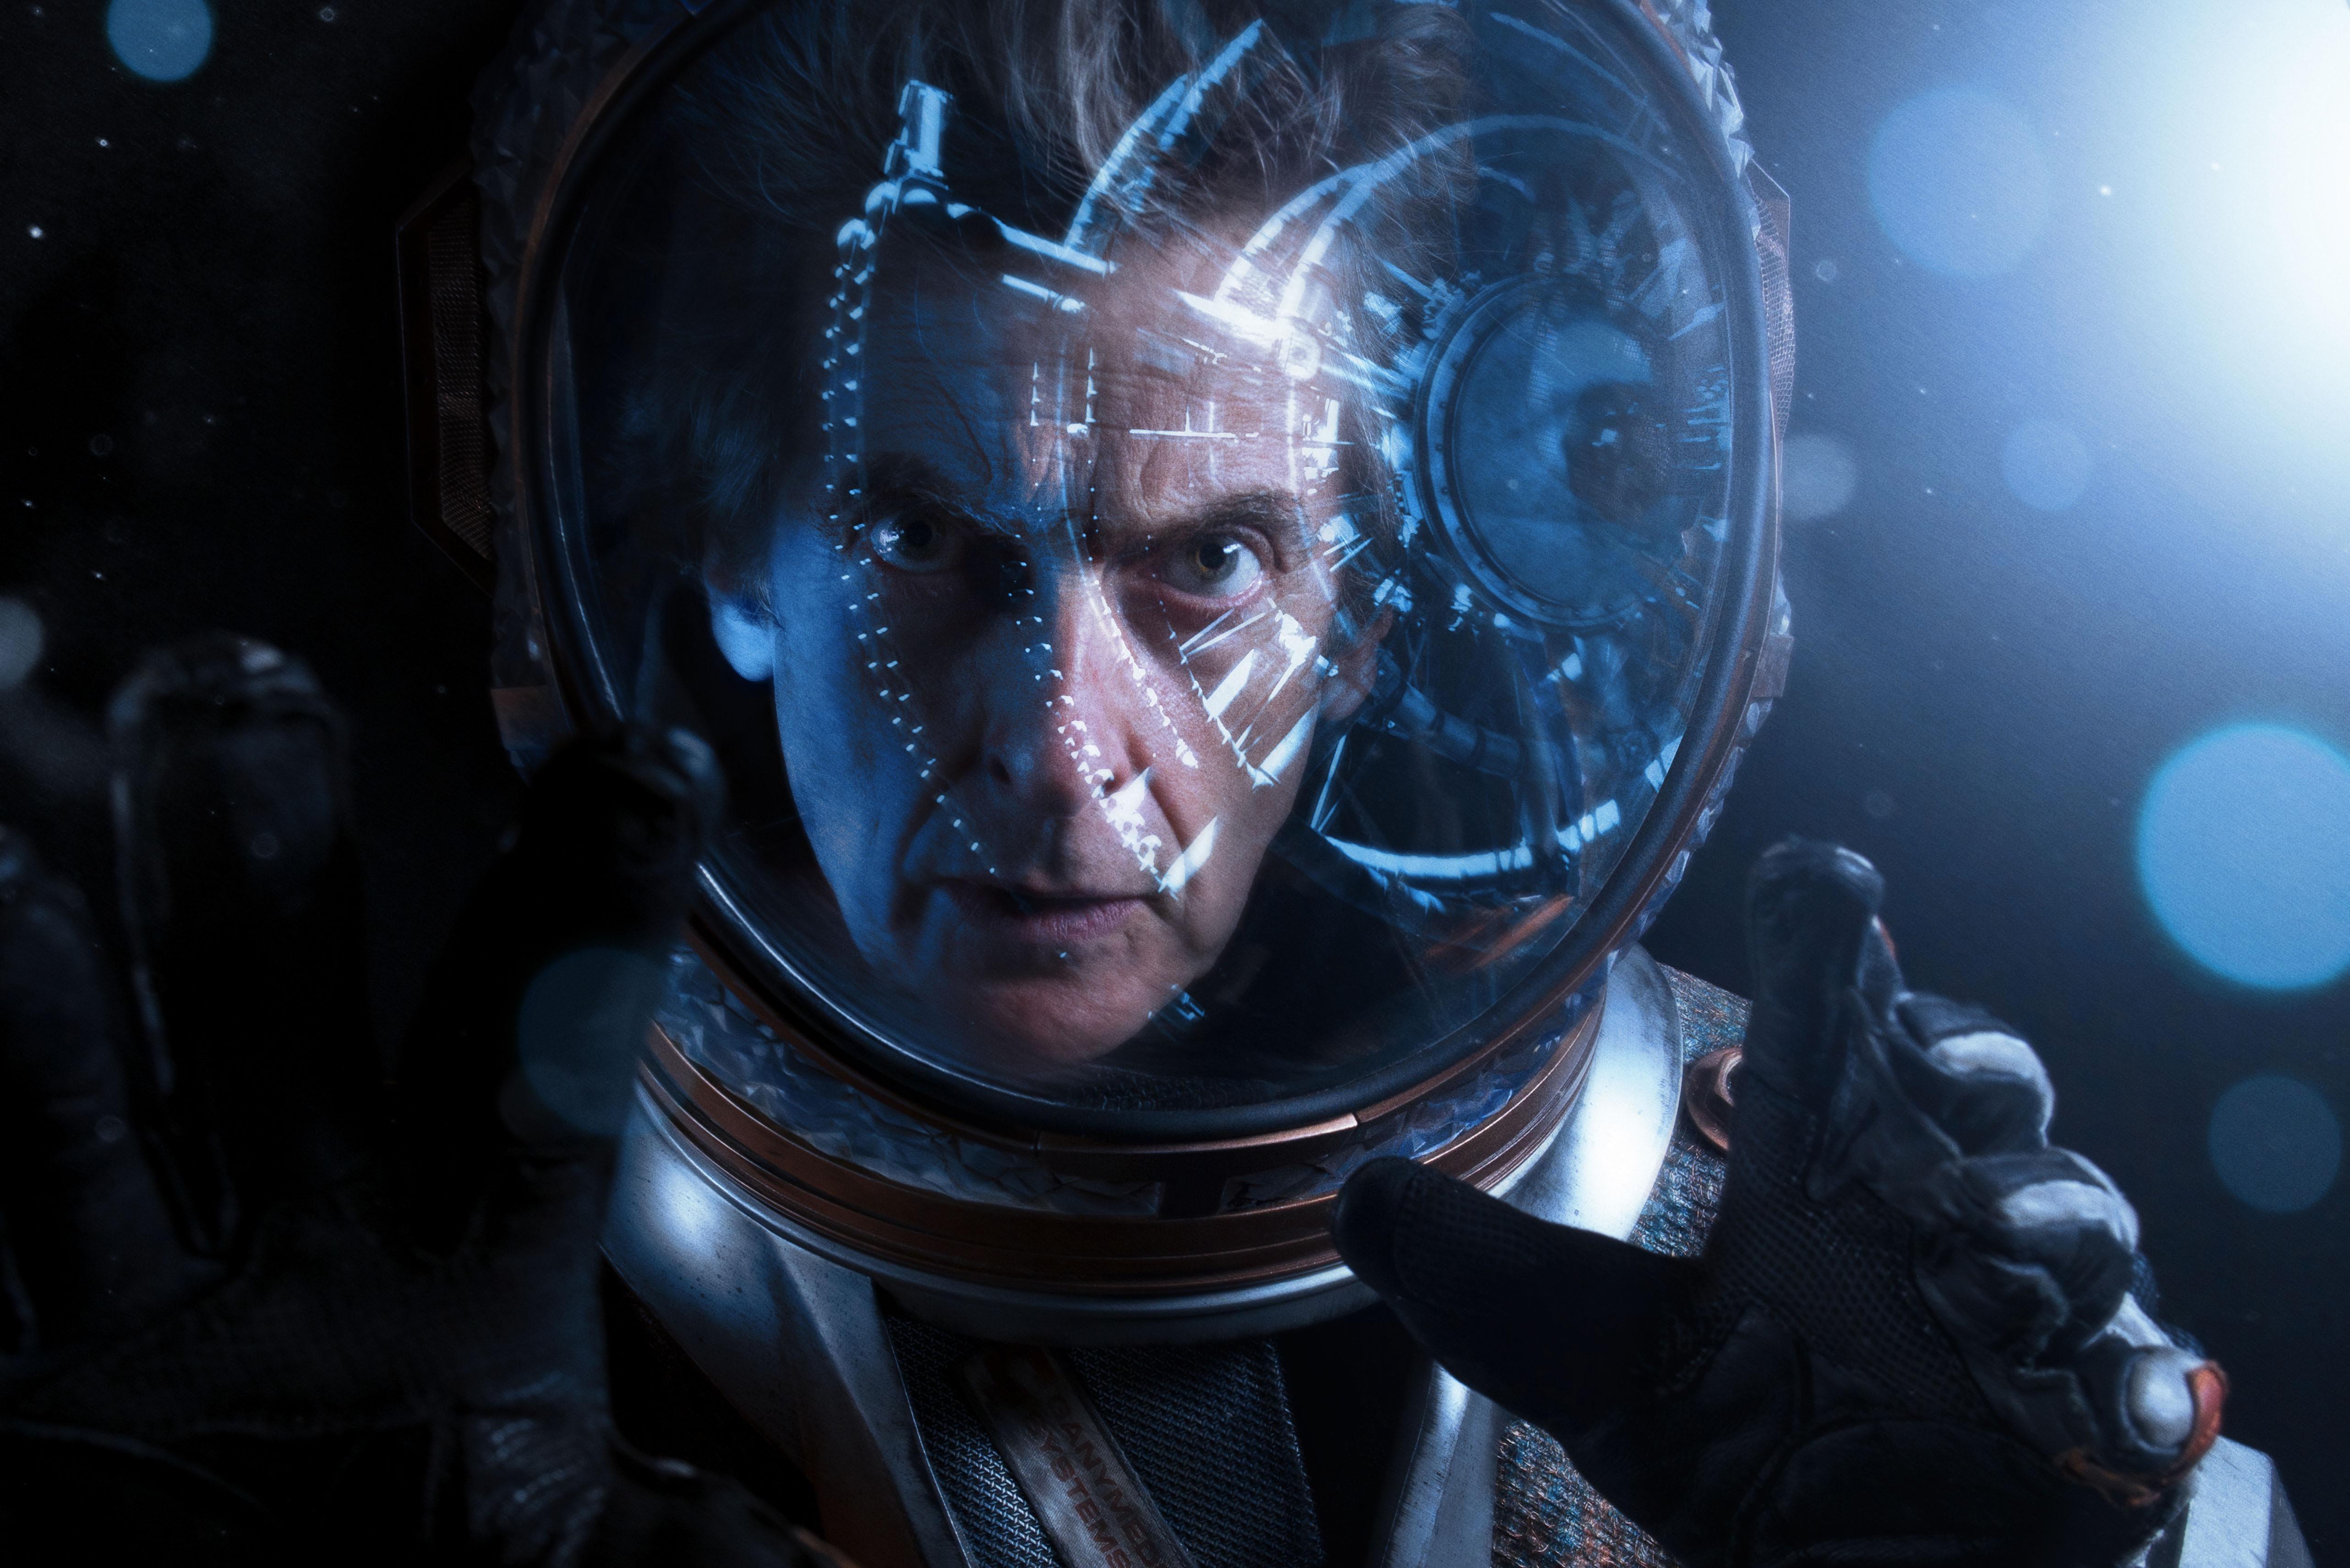 Doctor Who 10 5 main